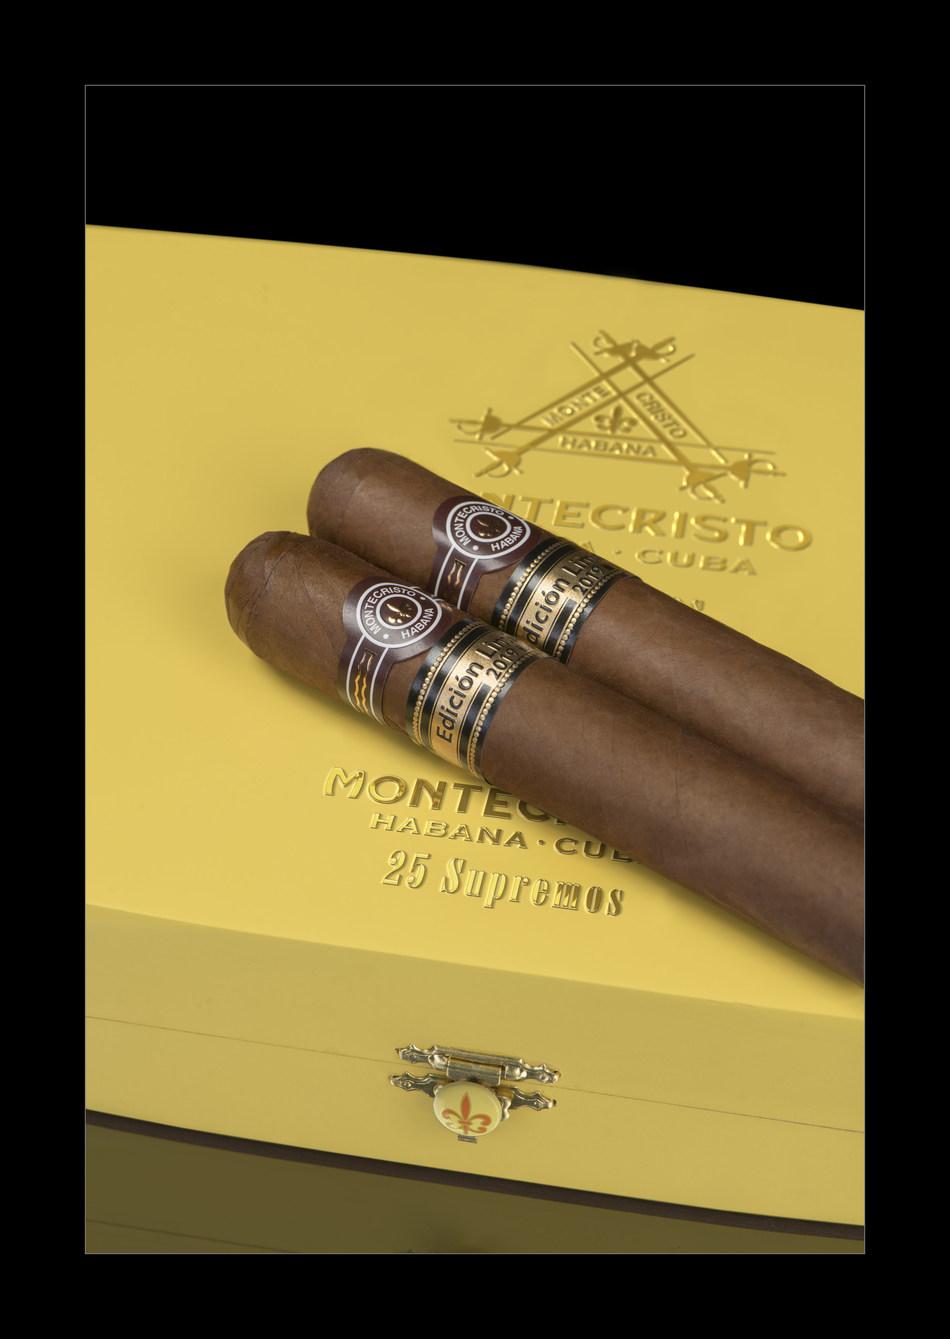 Montecristo Supremos box and habanos (PRNewsfoto/HABANOS SA)